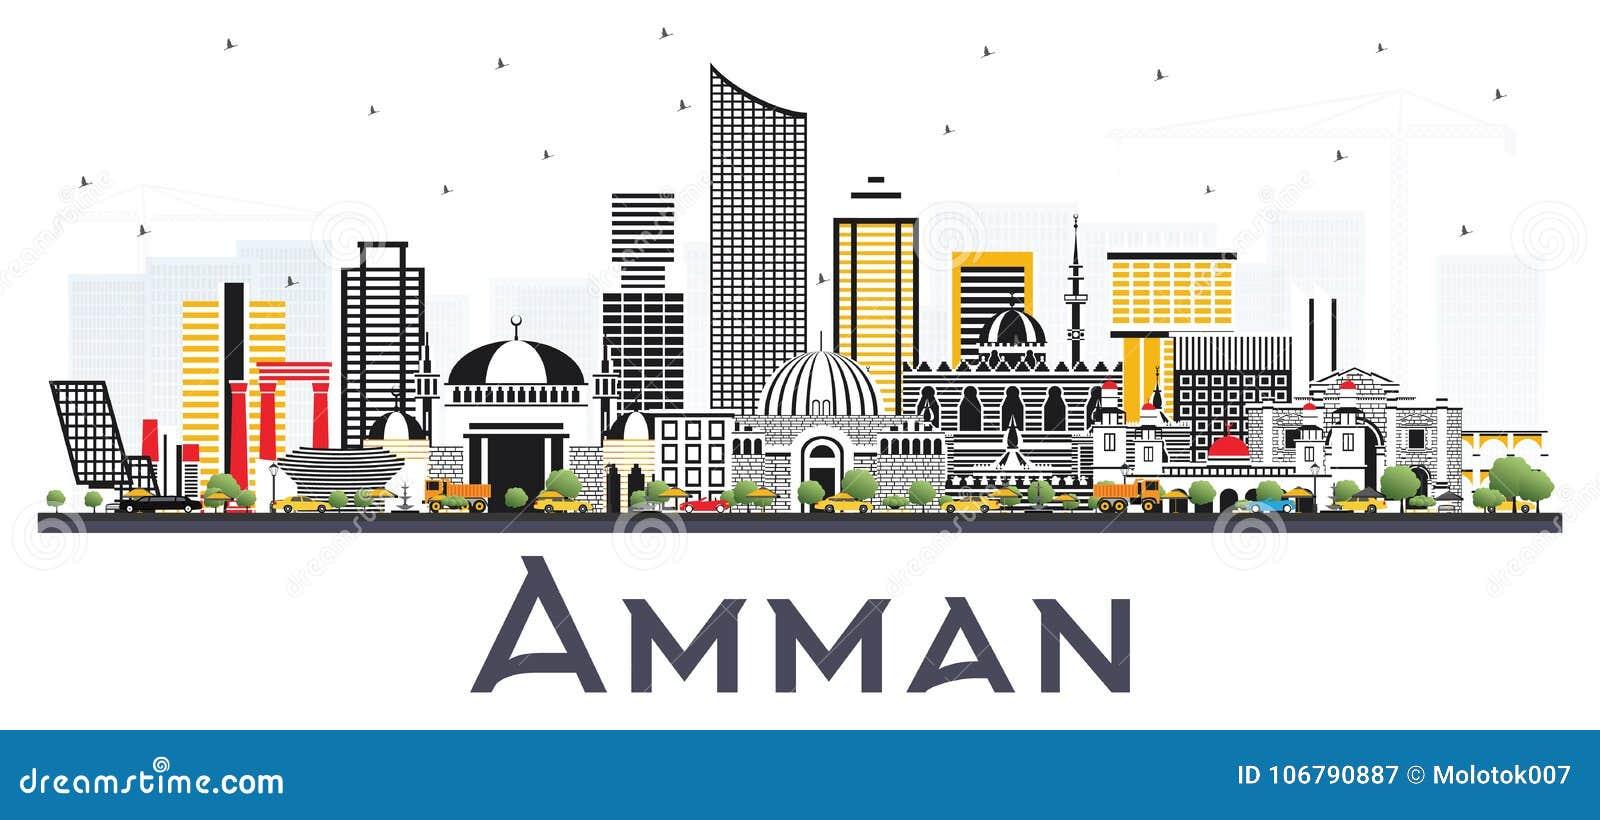 8fefac400fd7 Amman Jordan City Skyline With Color Buildings Isolated On White ...